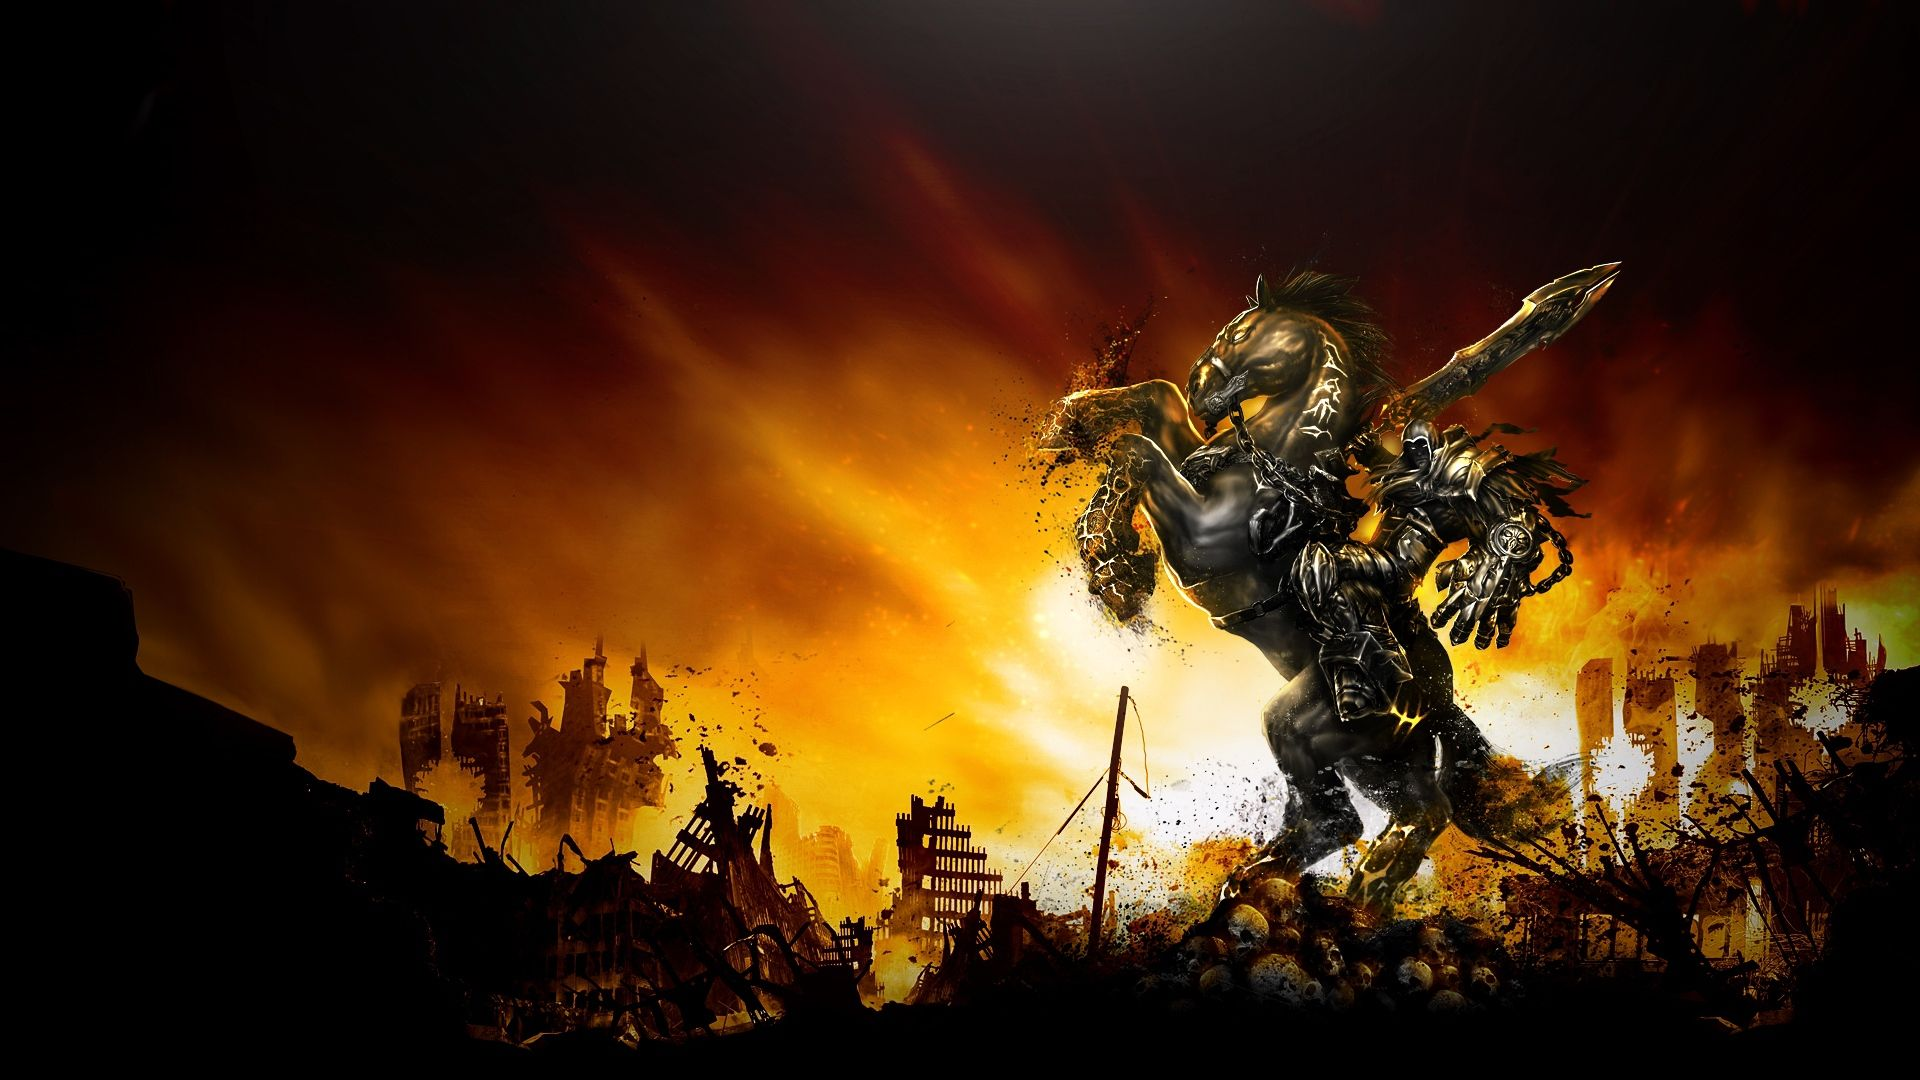 Darksiders War Wallpaper By: Stunning Darksiders War Horse Sunset City Ruin Download